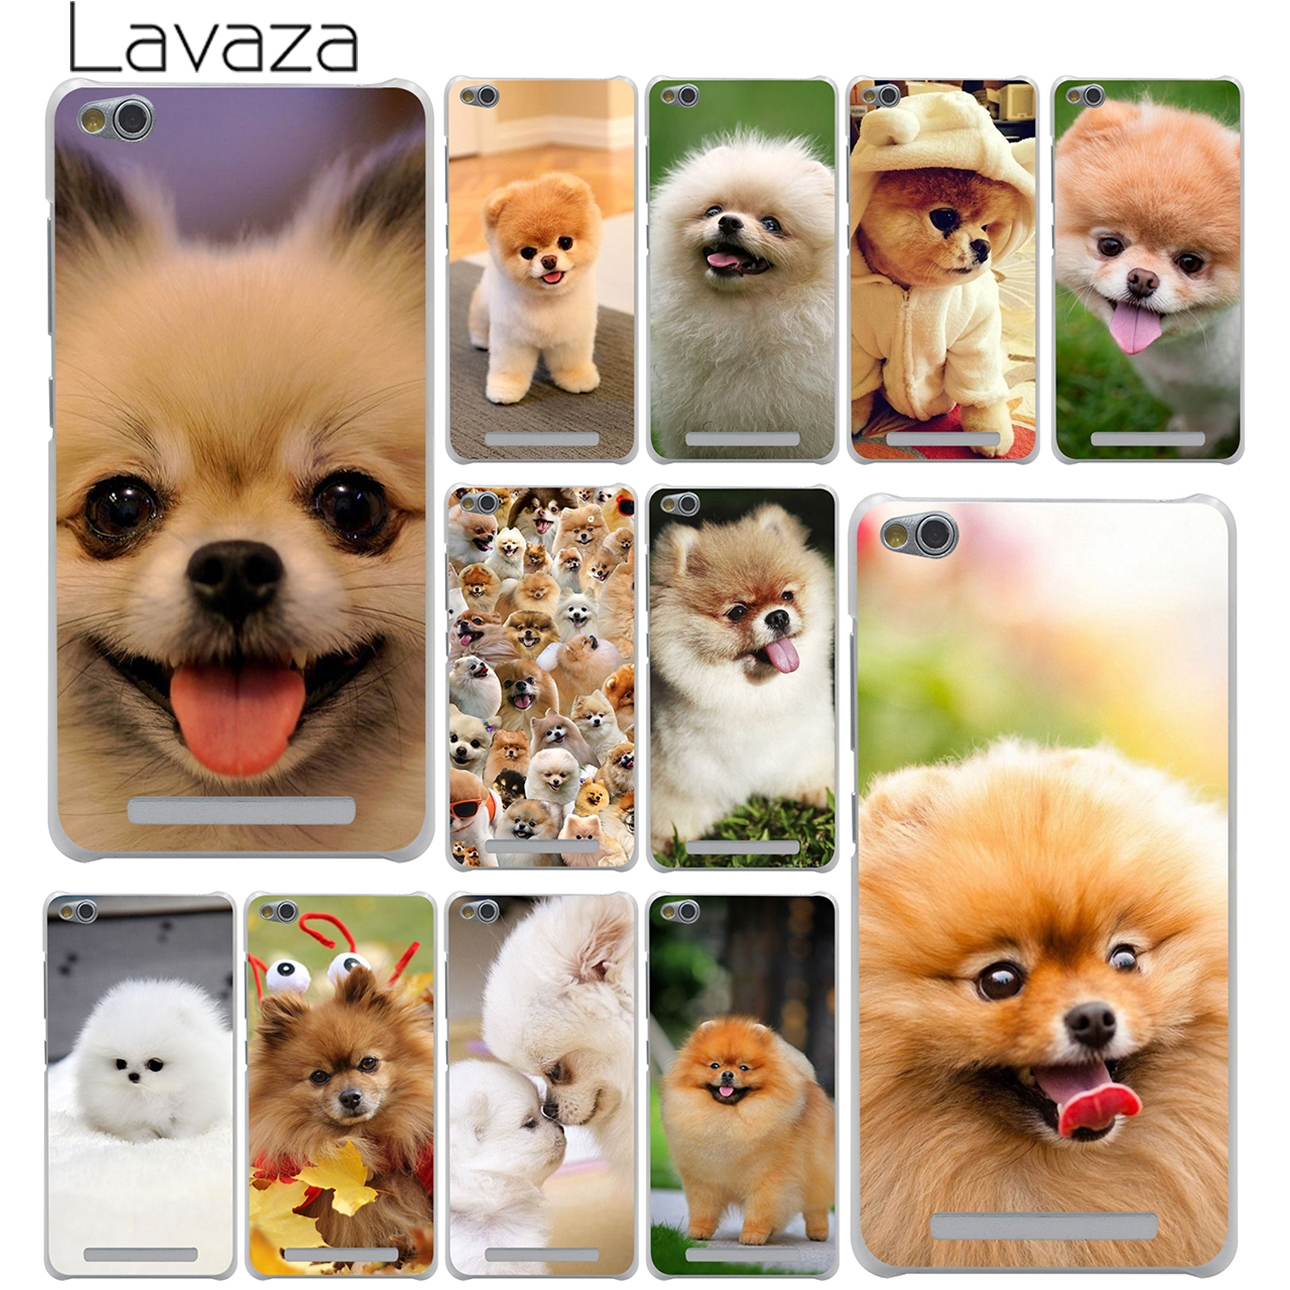 342556100 Lavaza كلب صغير طويل الشعر الكلاب الصلب الهاتف قذيفة حالة ل شياو mi mi  الأحمر mi S2 6A 4A زائد ملاحظة 7 5 4 4X6 برو 5A رئيس غطاء